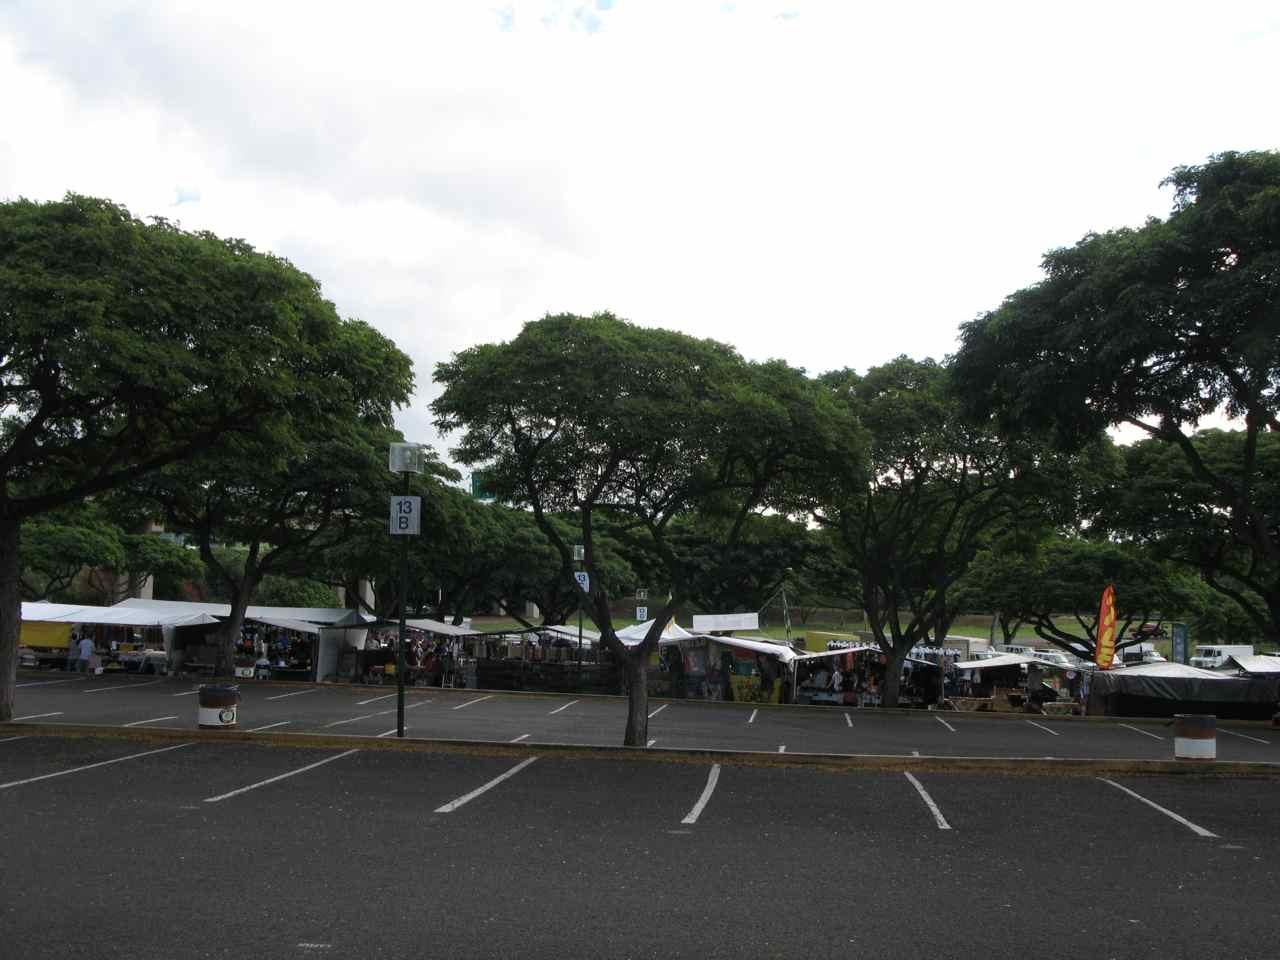 rothwell swap meet 2012 nfl